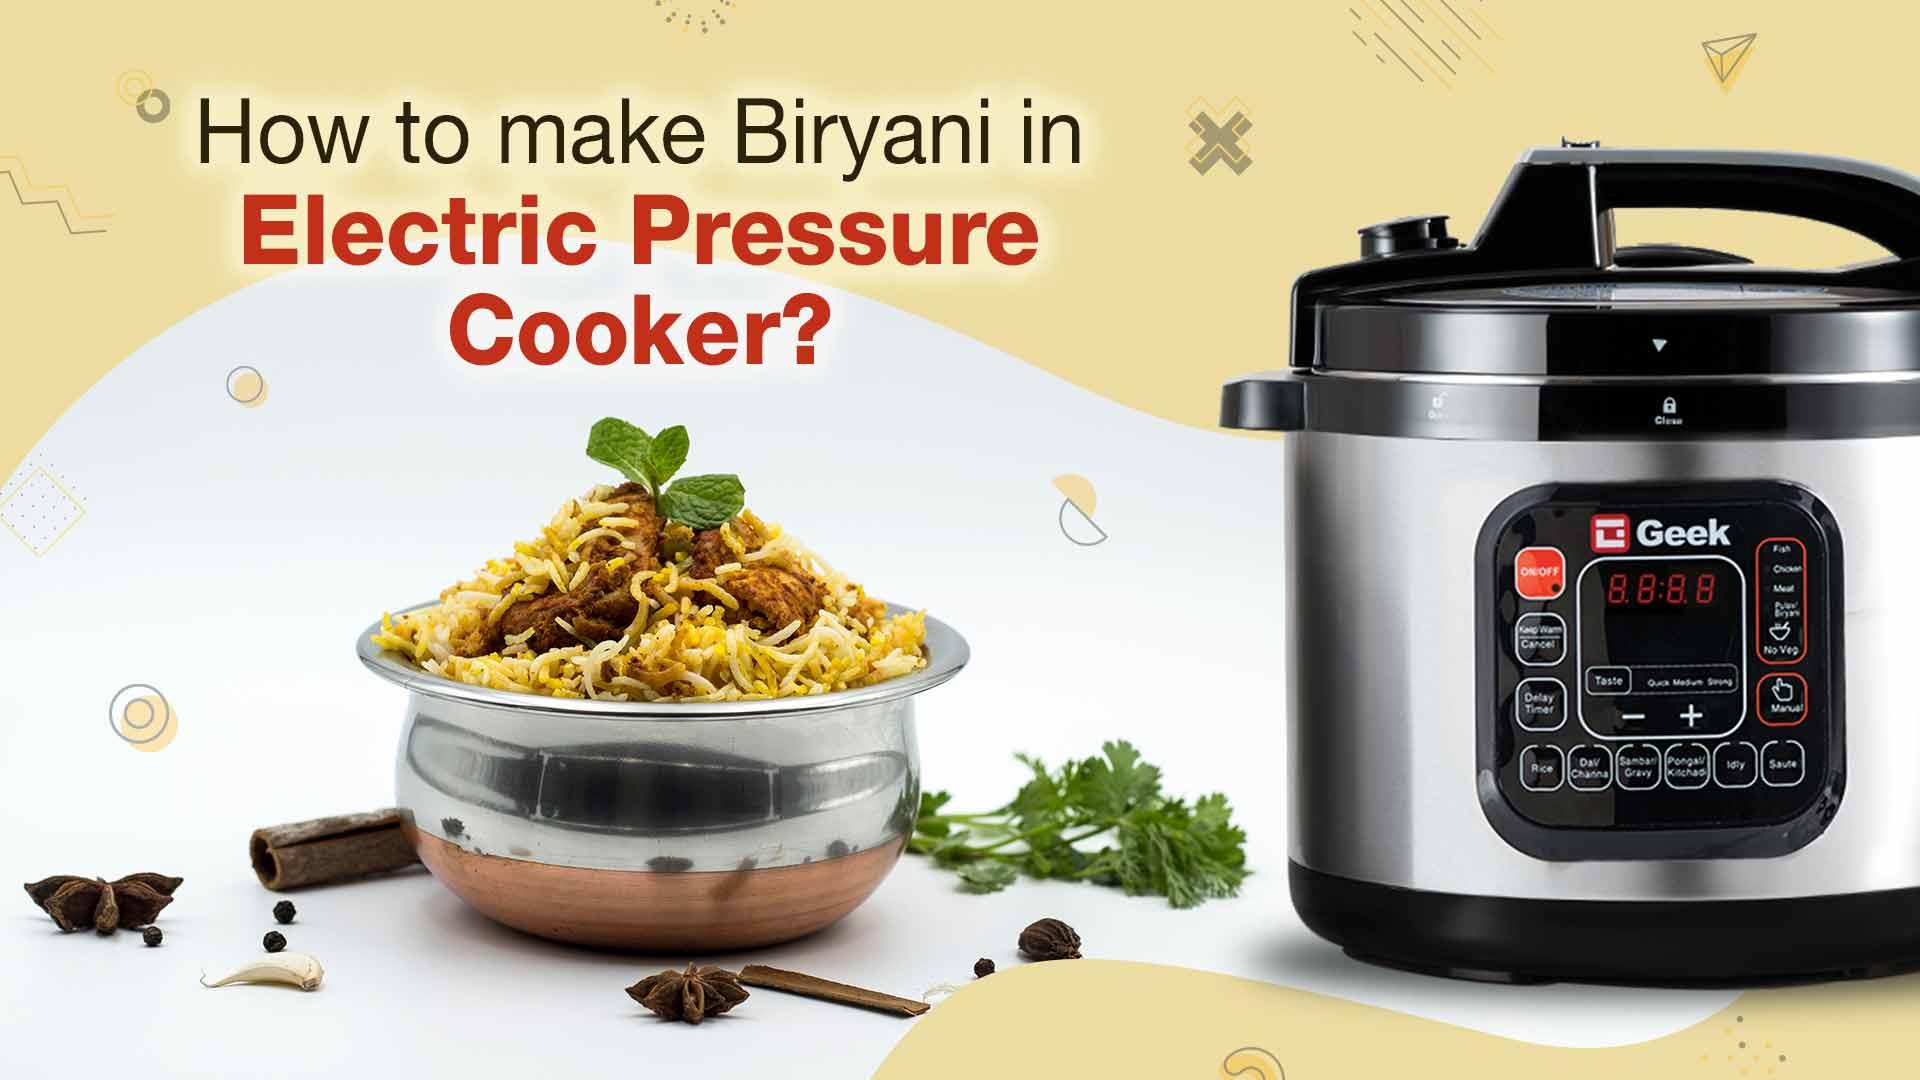 biryani in electric pressure cooker